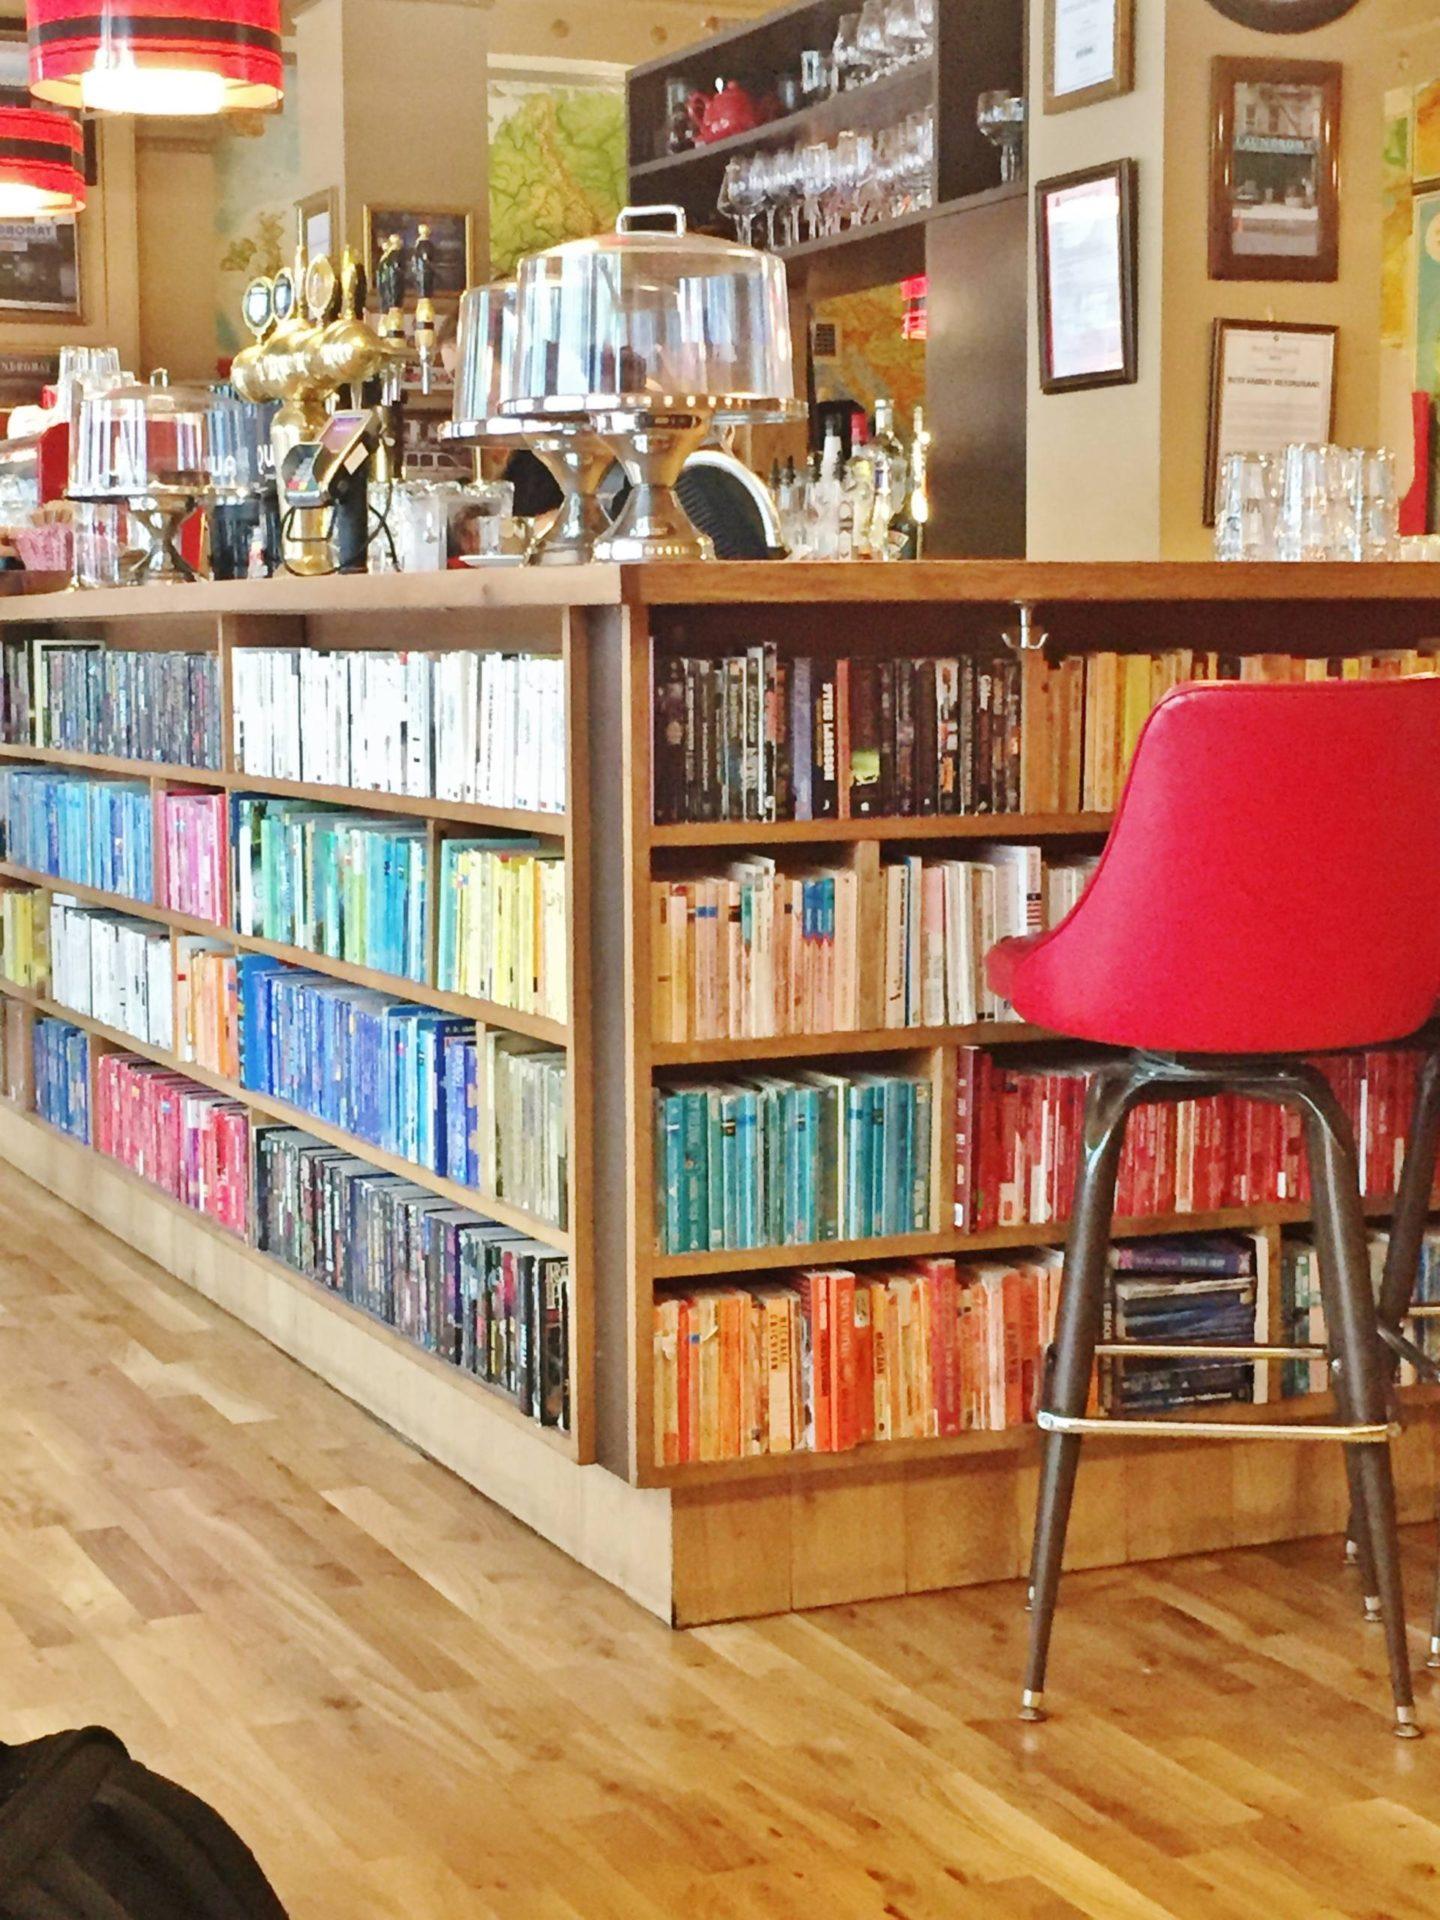 Emma Victoria Stokes Iceland Reykavik Laundromat Cafe Breakfast Books